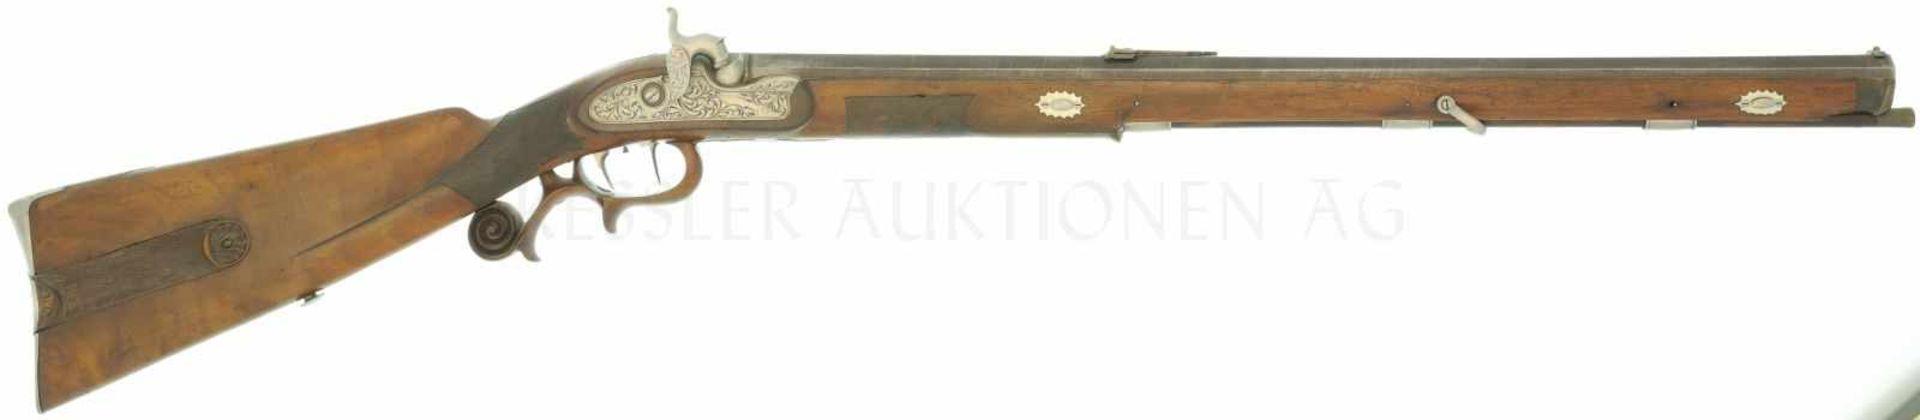 Jägerstutzen, Rieger in München, Perkussionszündung, Kal. 14mm LL 620mm, TL 1035mm, brünierter